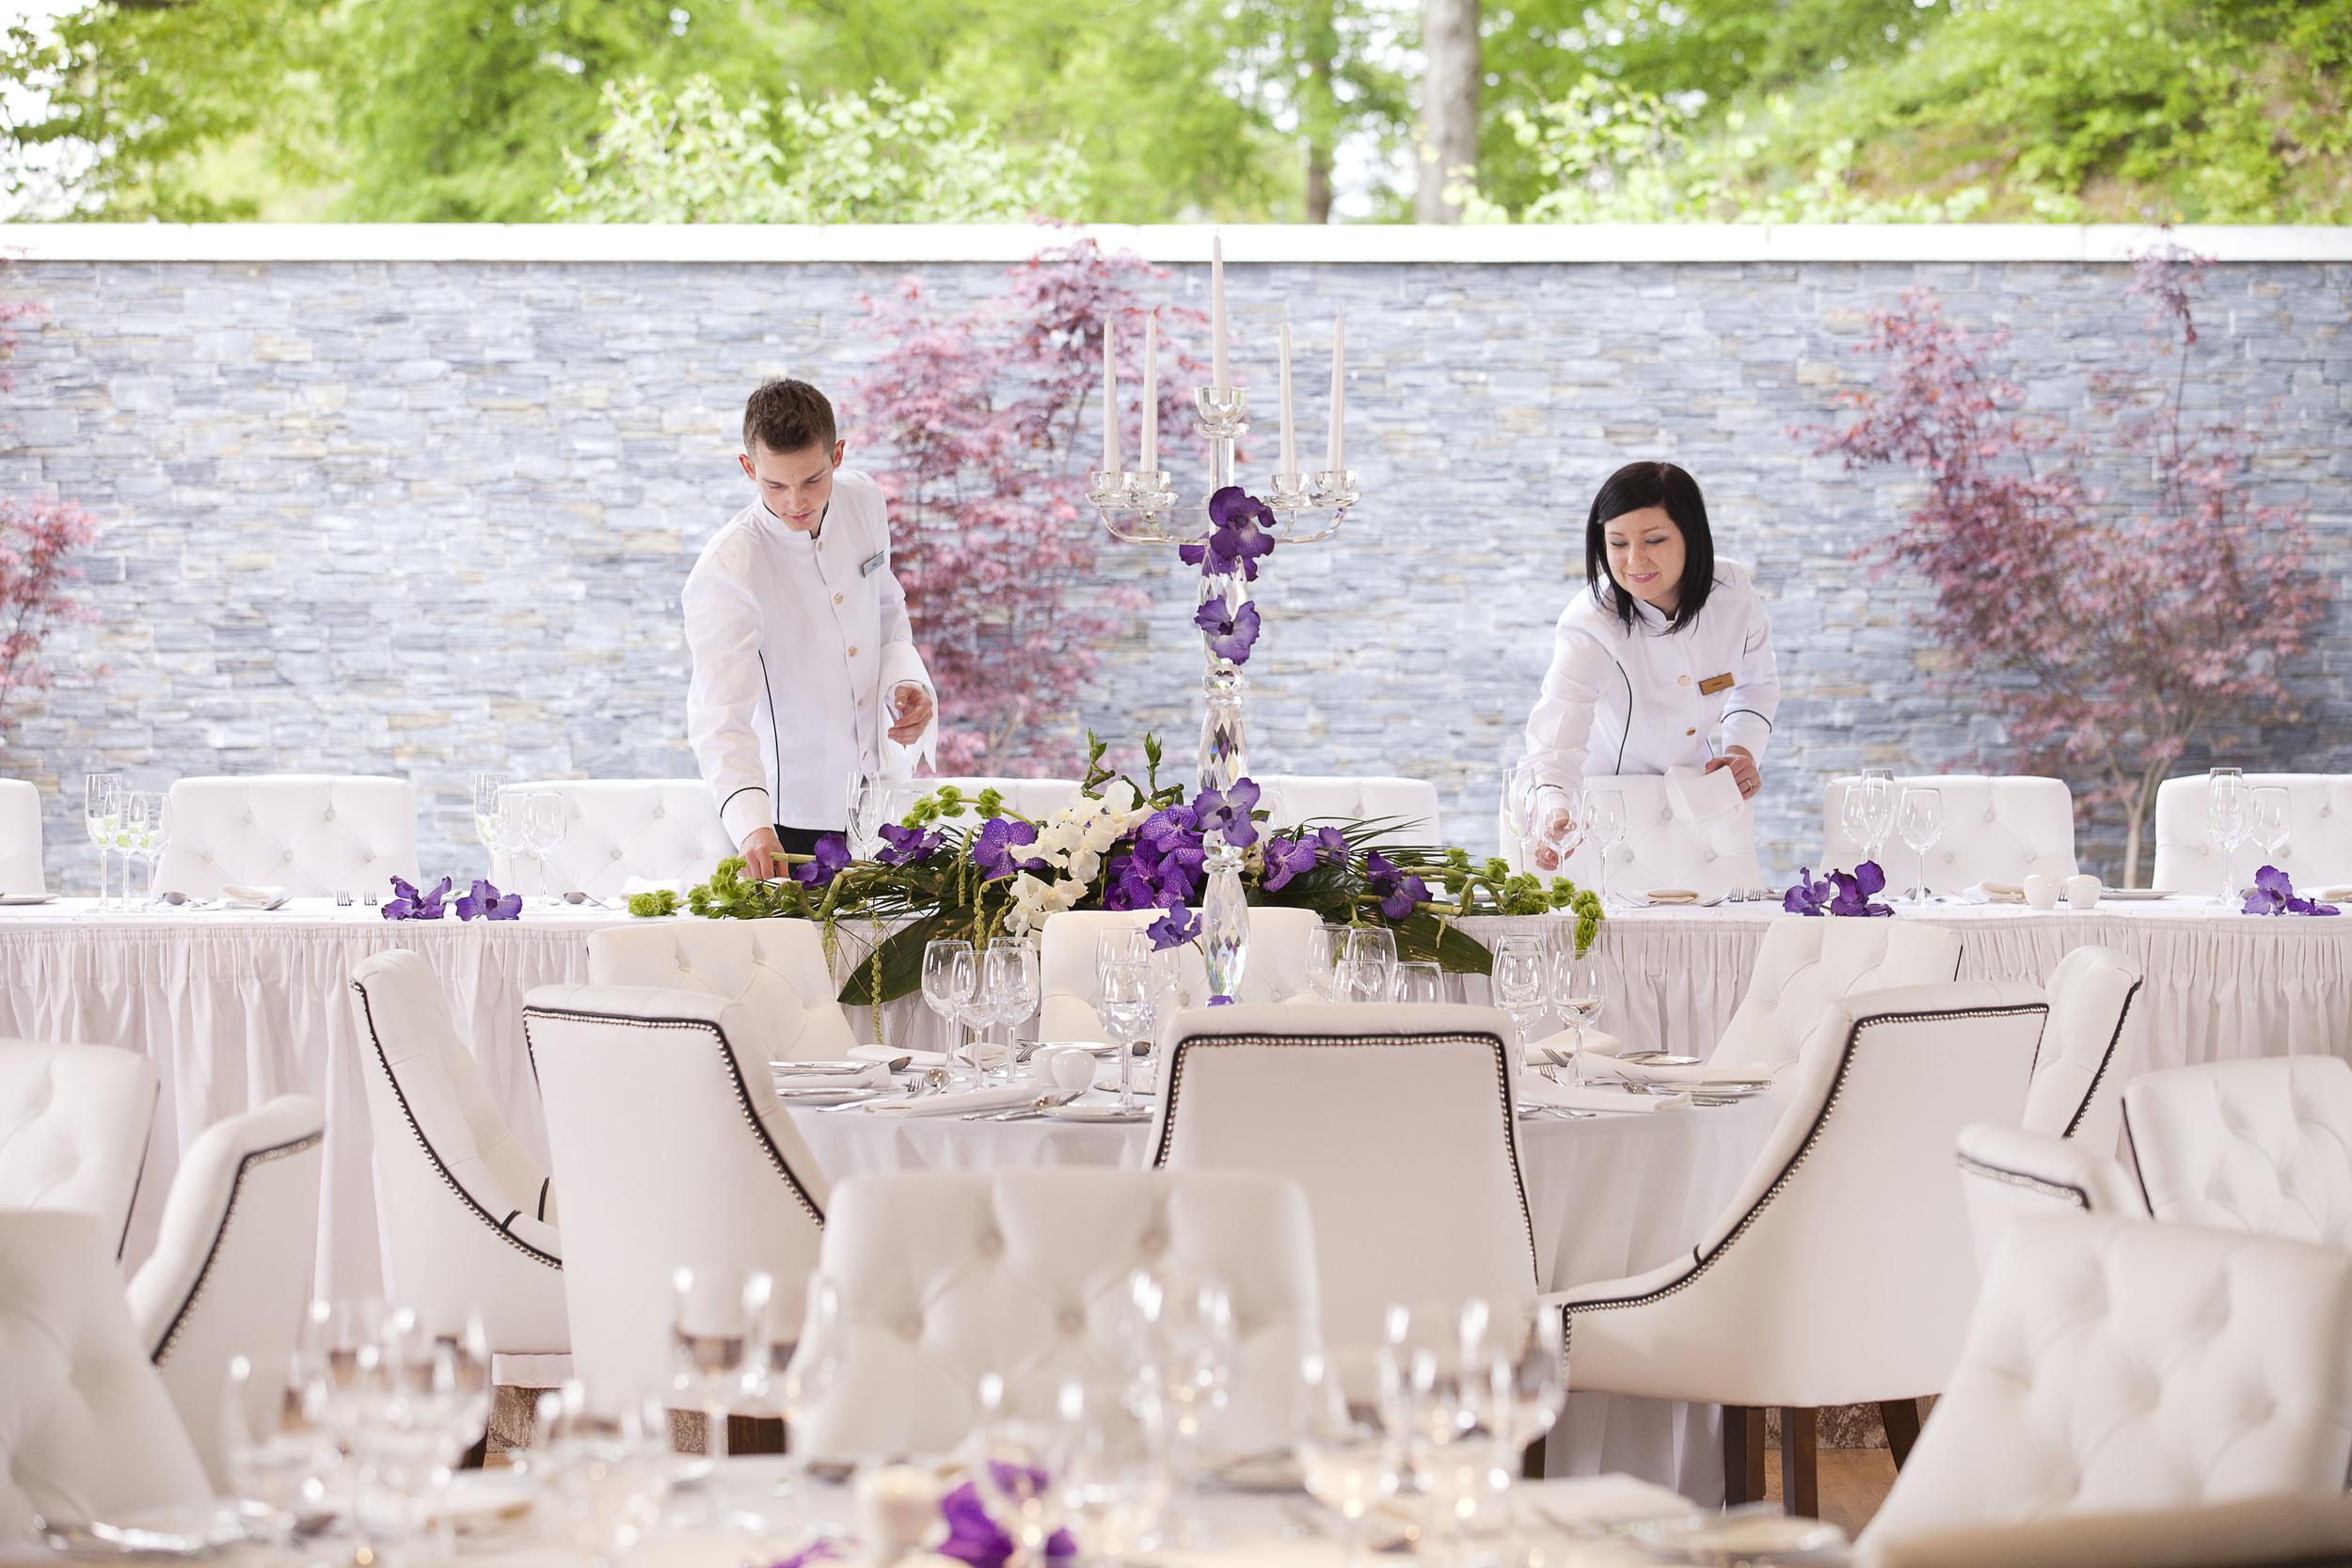 Galgorm resort - Luxury Hotel & Spa